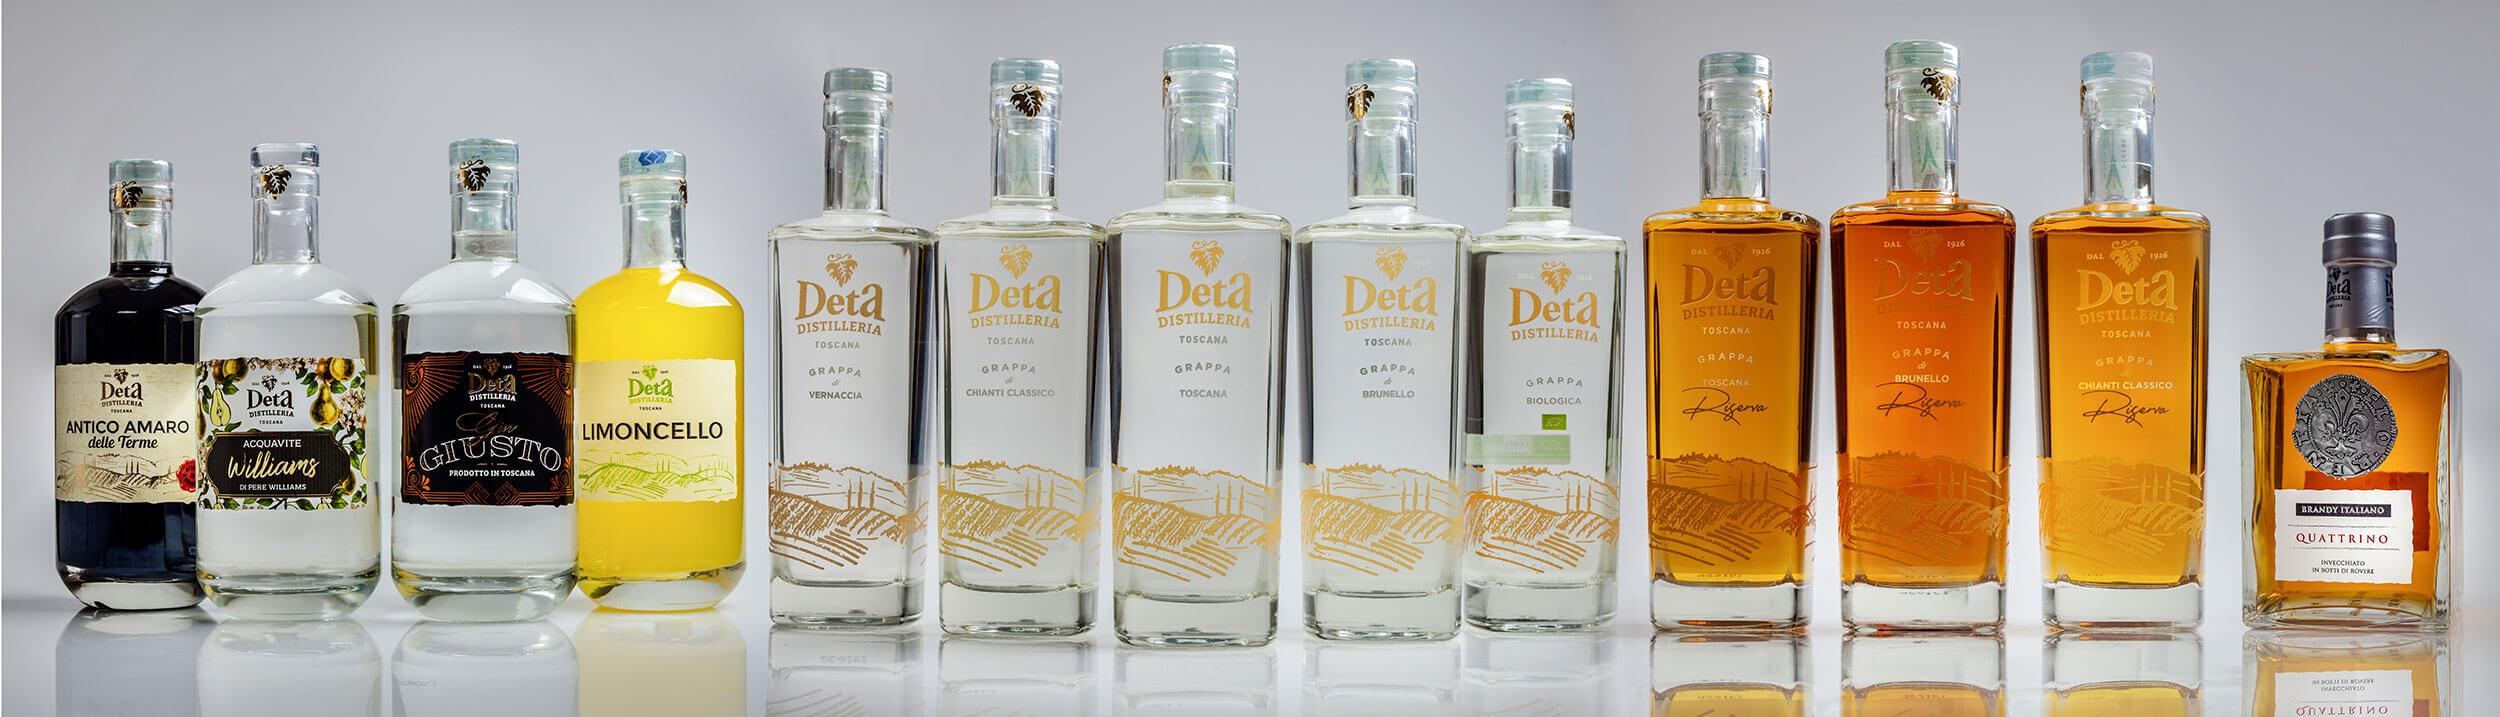 panoramica-bottiglie